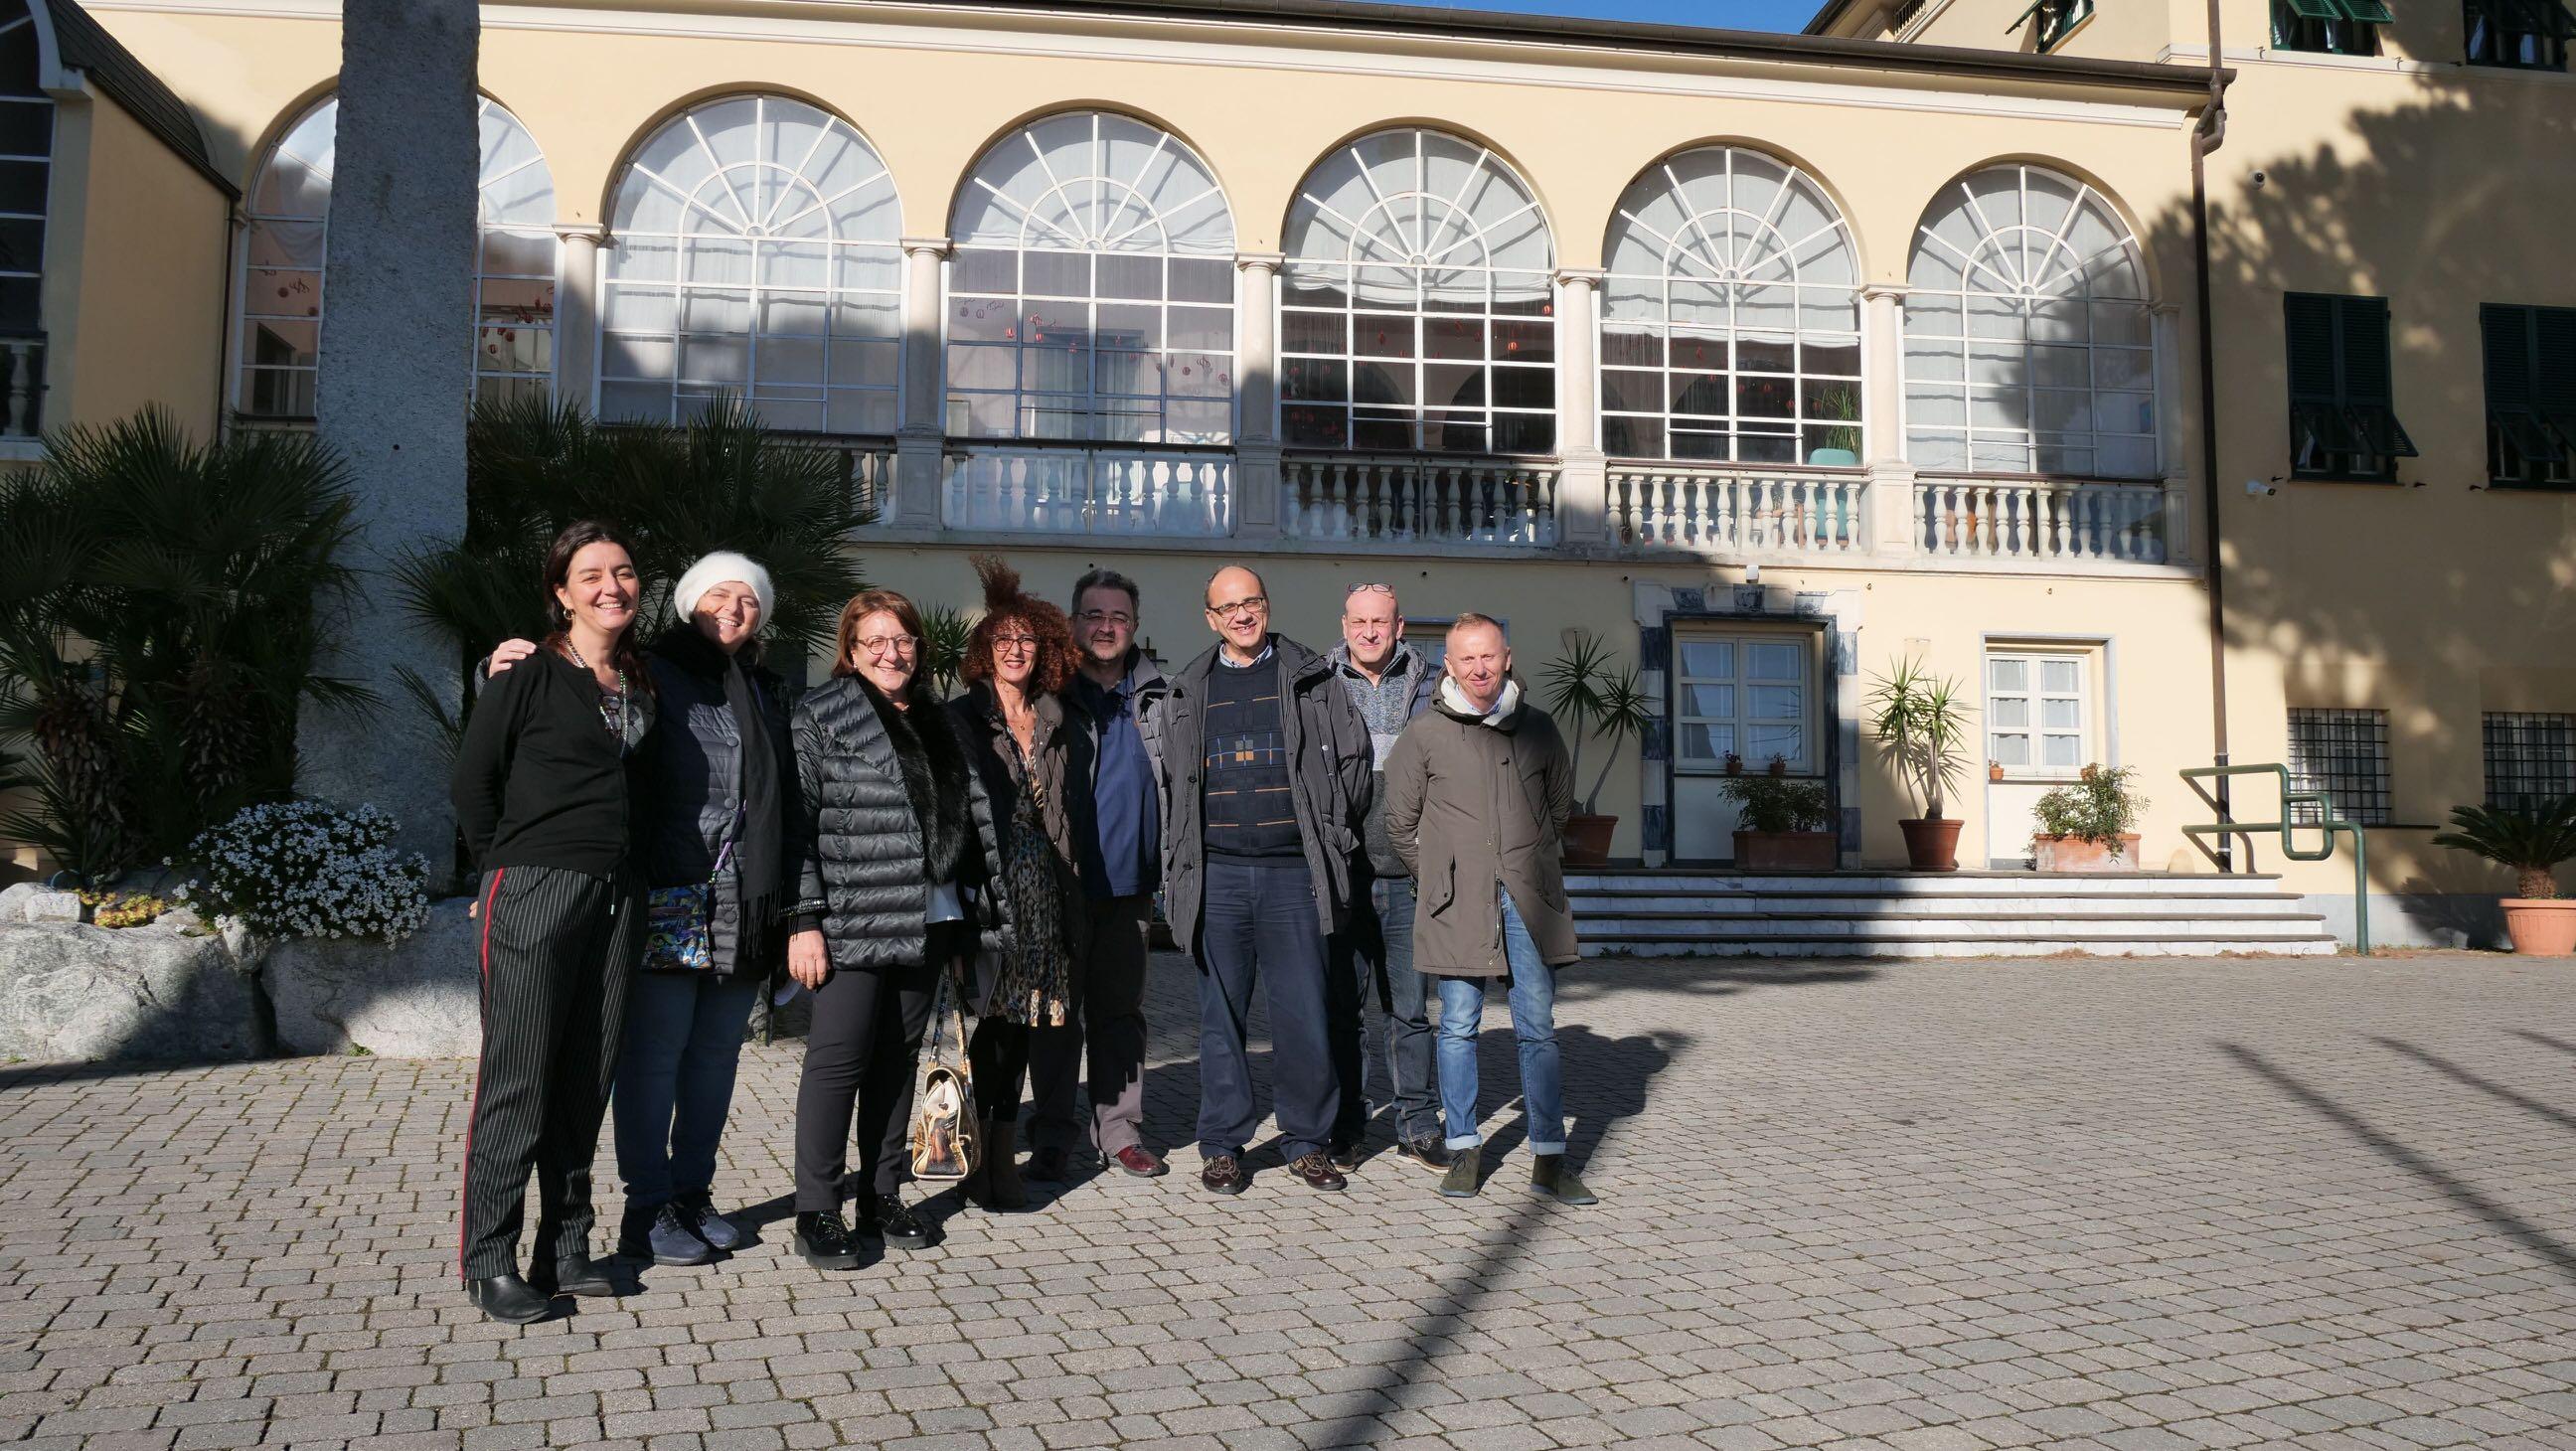 Visita responsabili don Orione Pescara 2019.01.24 - 3